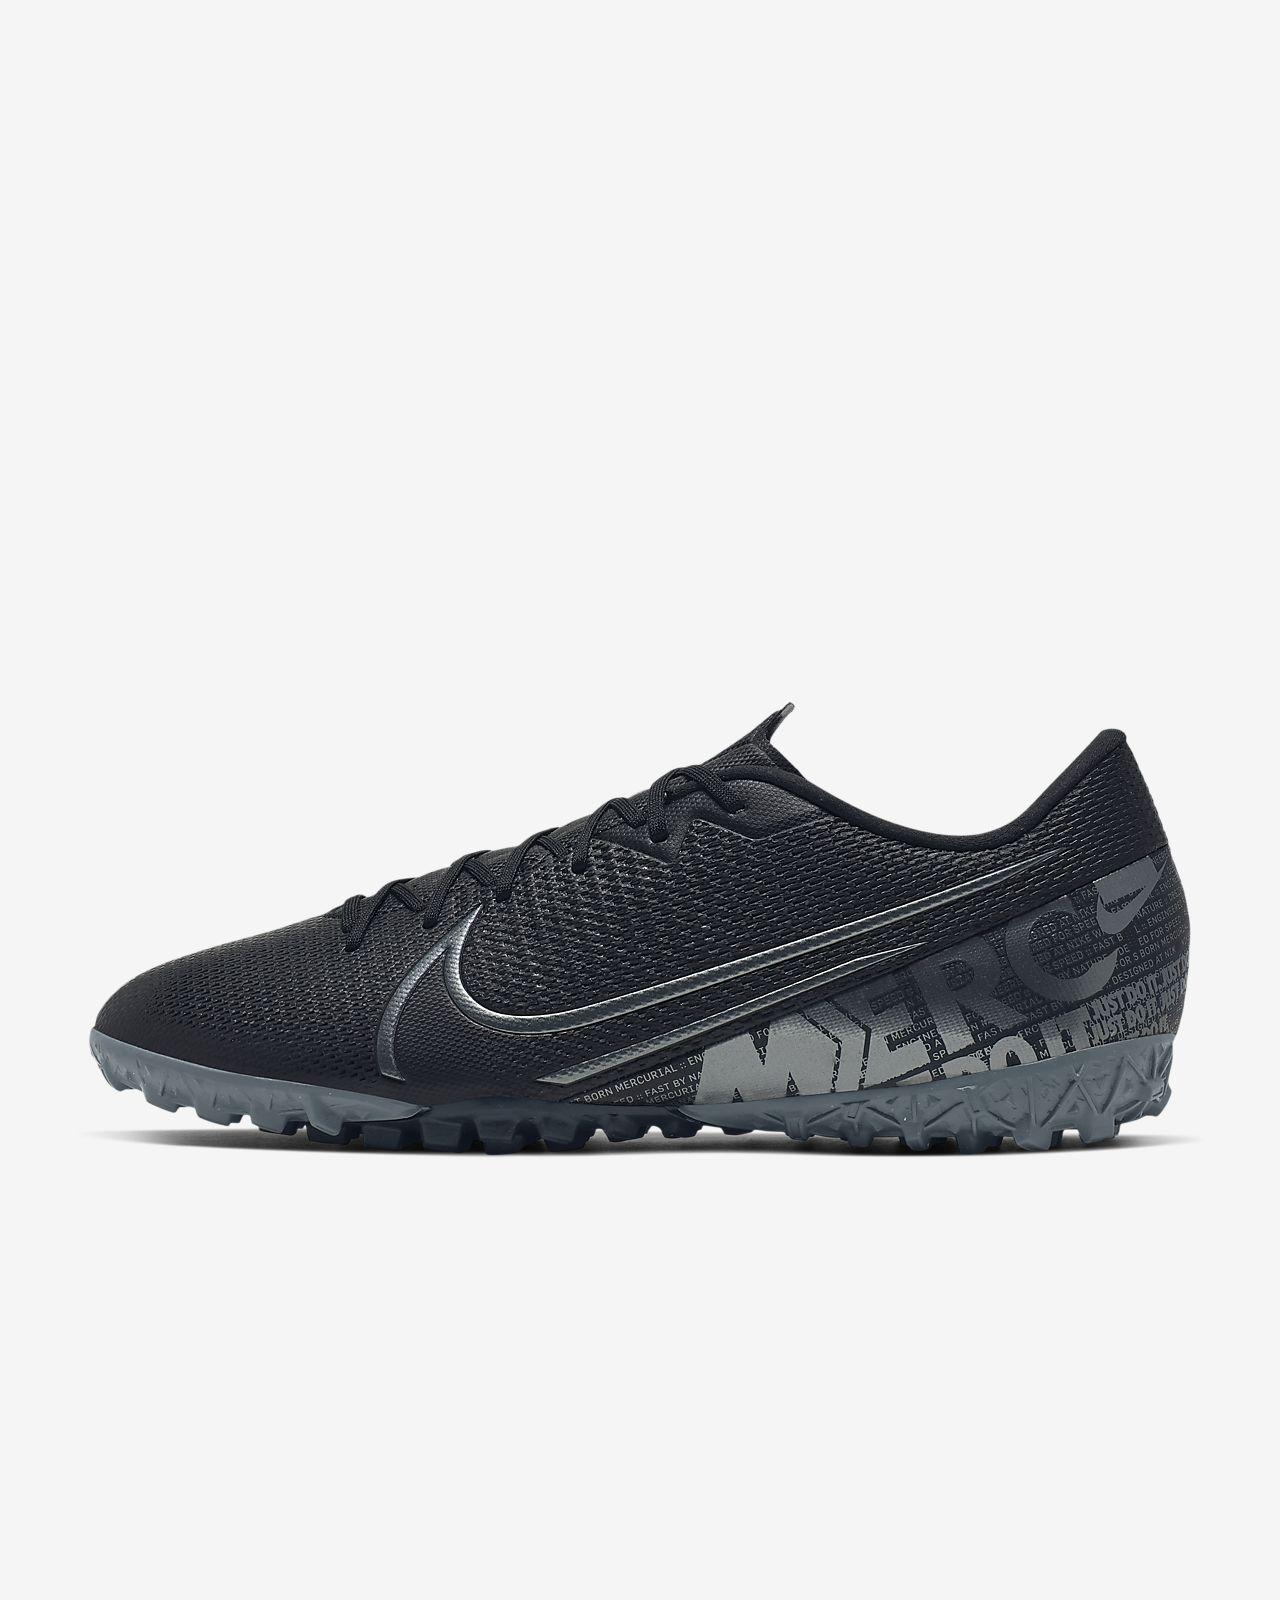 Chaussure de football pour surface synthétique Nike Mercurial Vapor 13 Academy TF